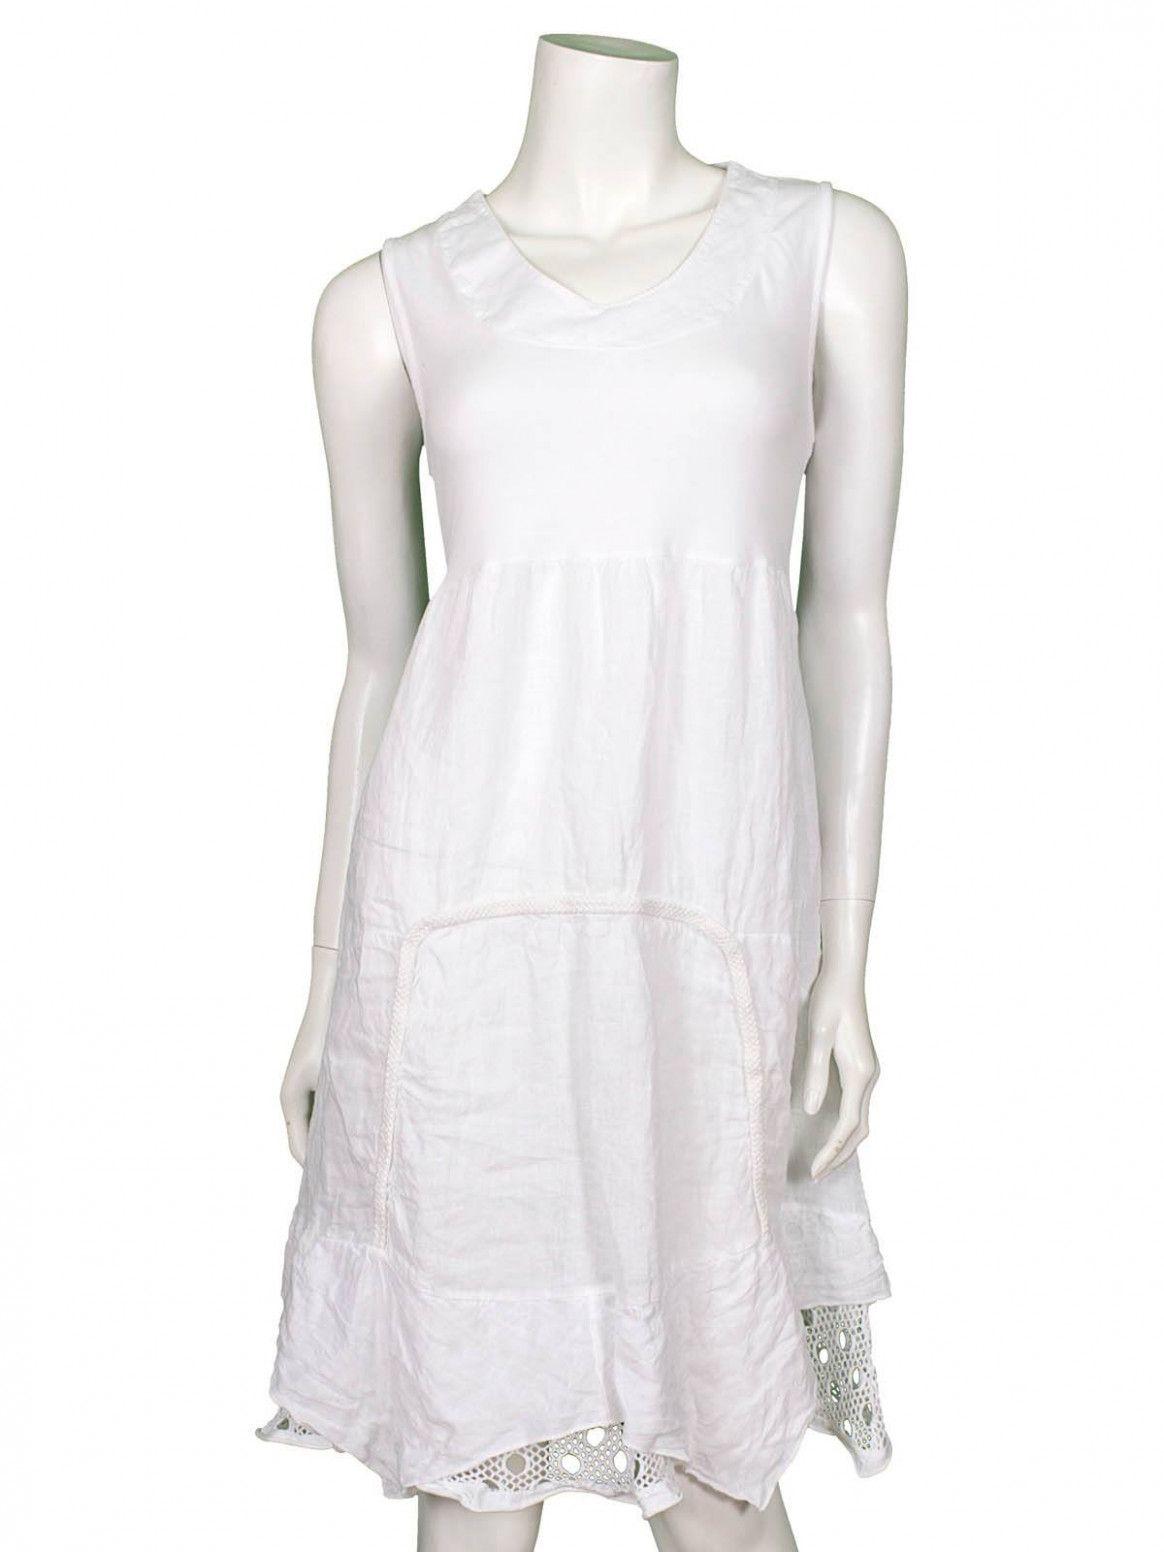 15 Kleid Weiß nel 2020